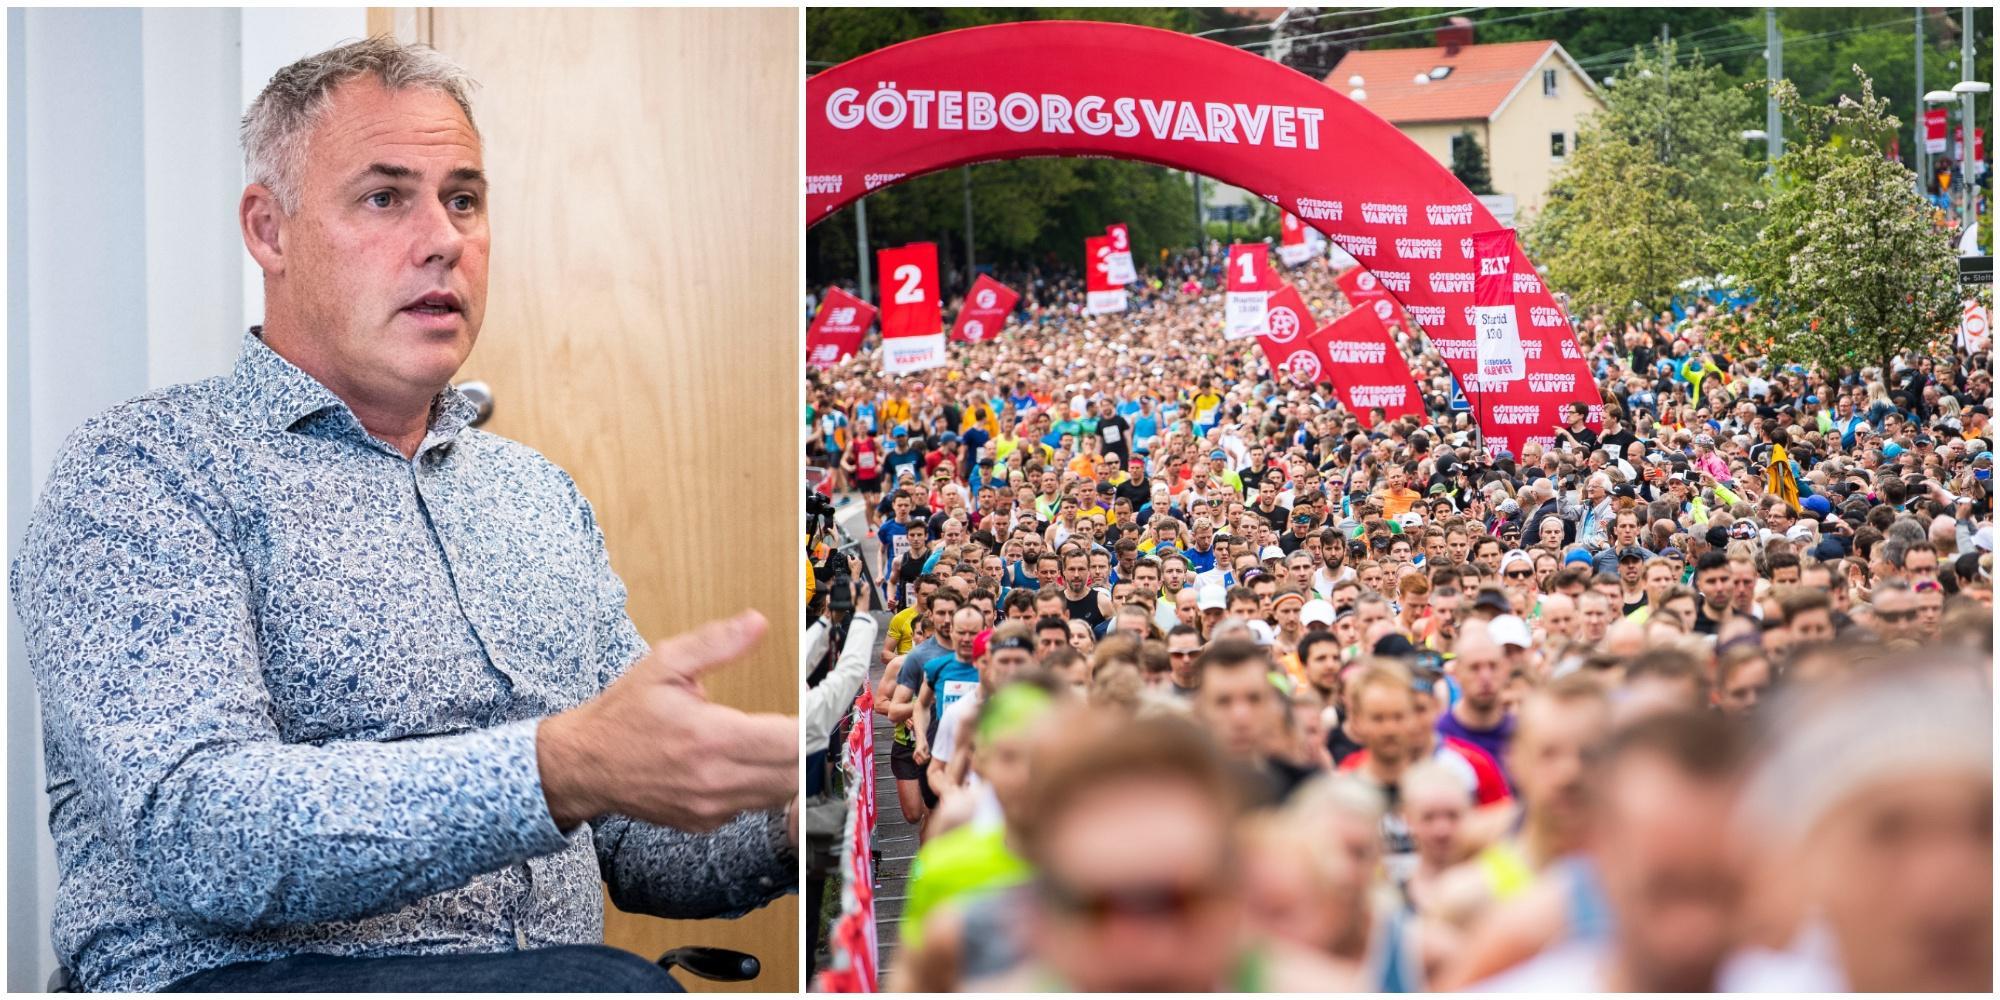 Göteborgsvarvets besvikelse efter regeringens besked